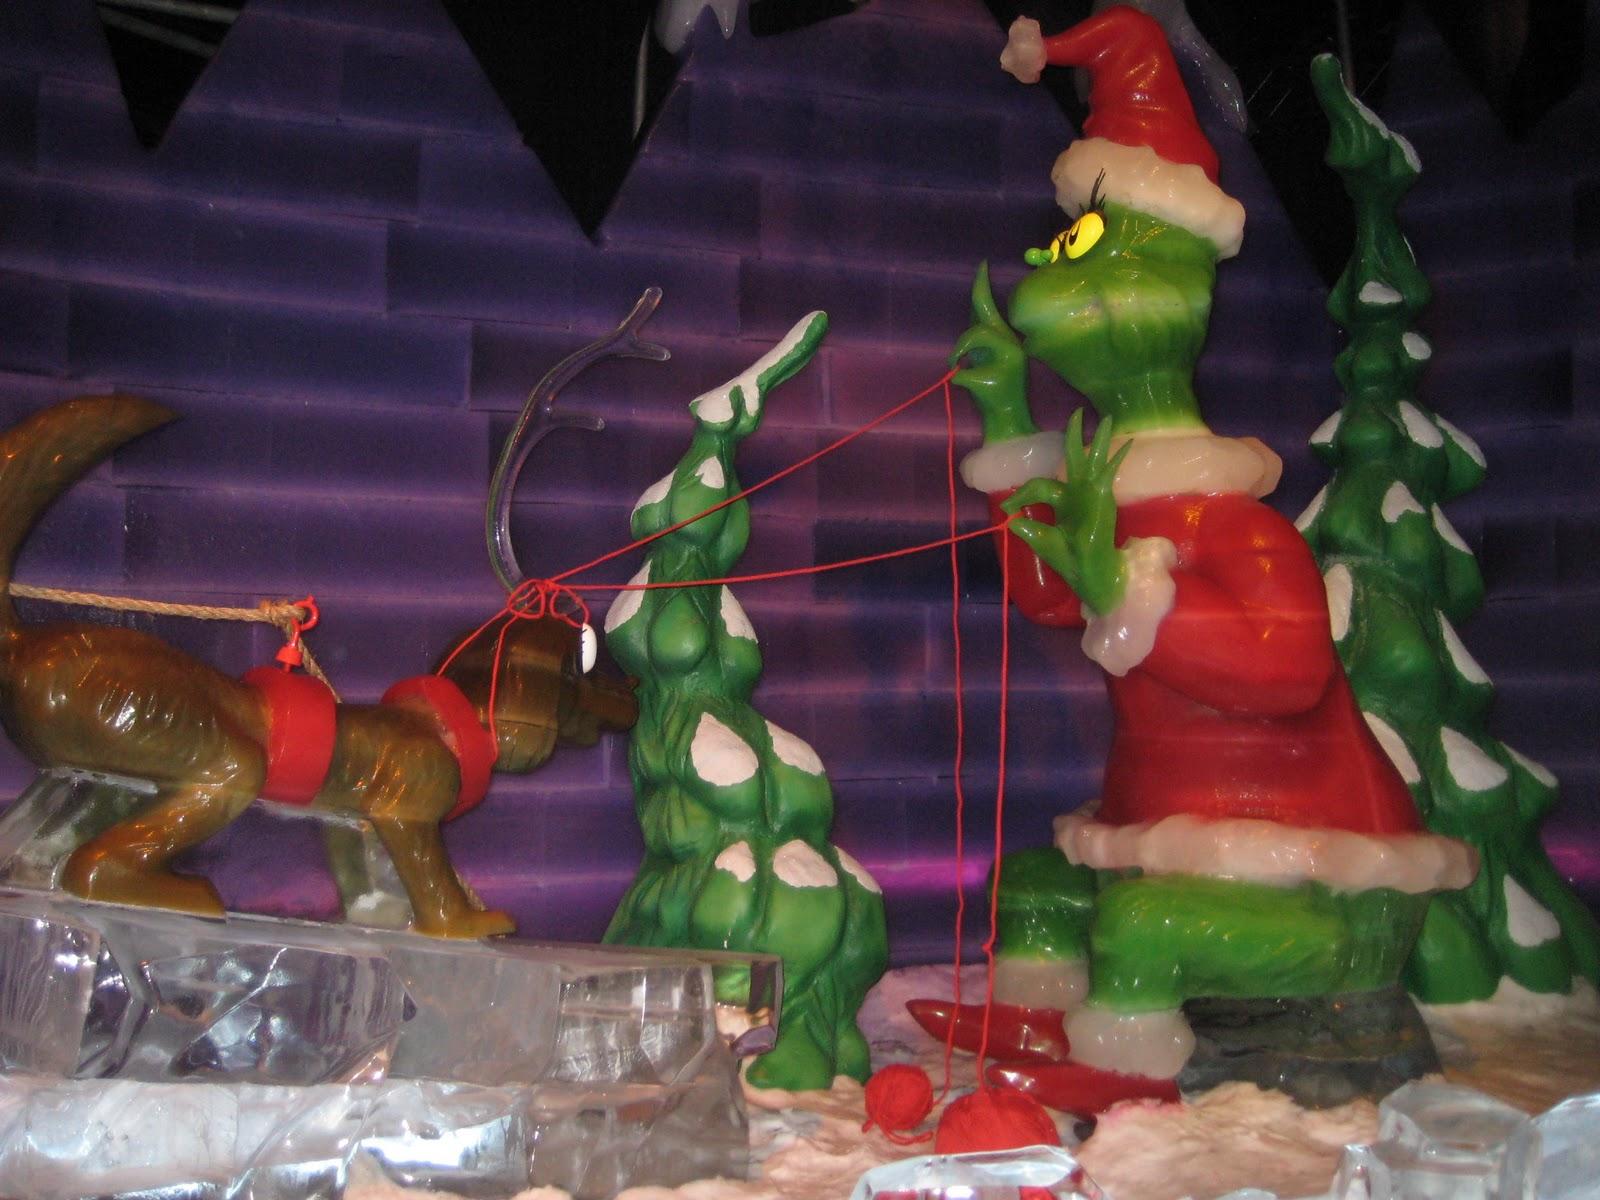 Grinch christmas creeping grinch stealing lights outdoor wood yard art